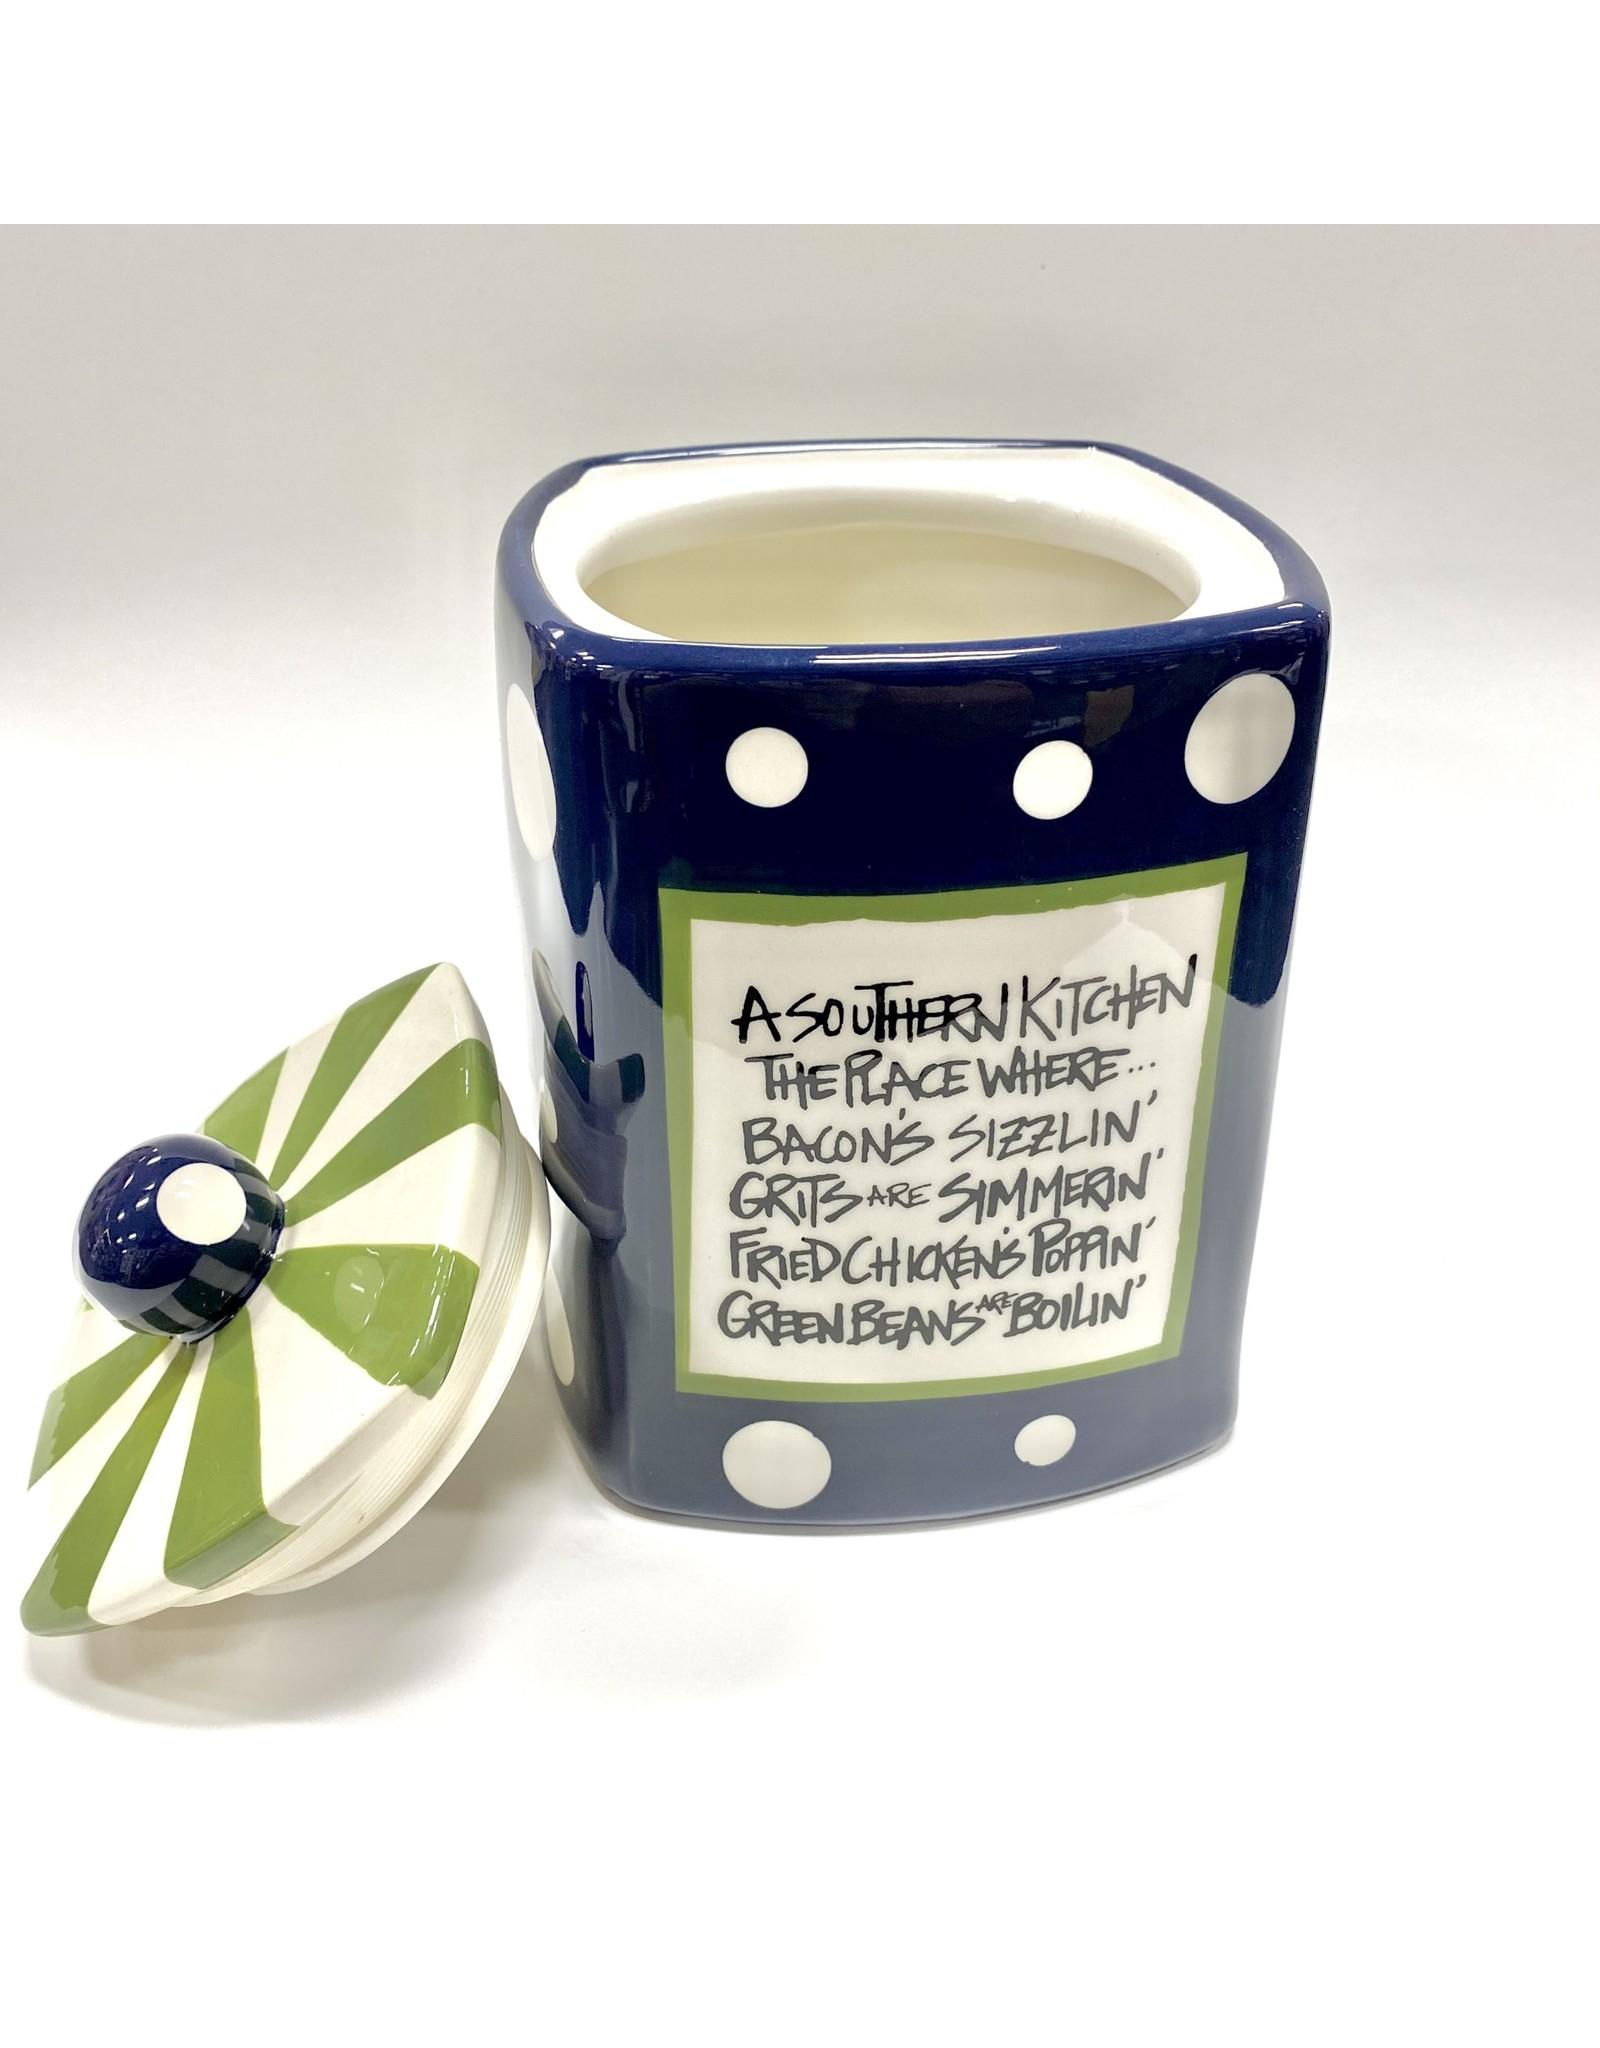 "Magnolia Lane Cookie Jar ""The South"" by Magnolia Lane"